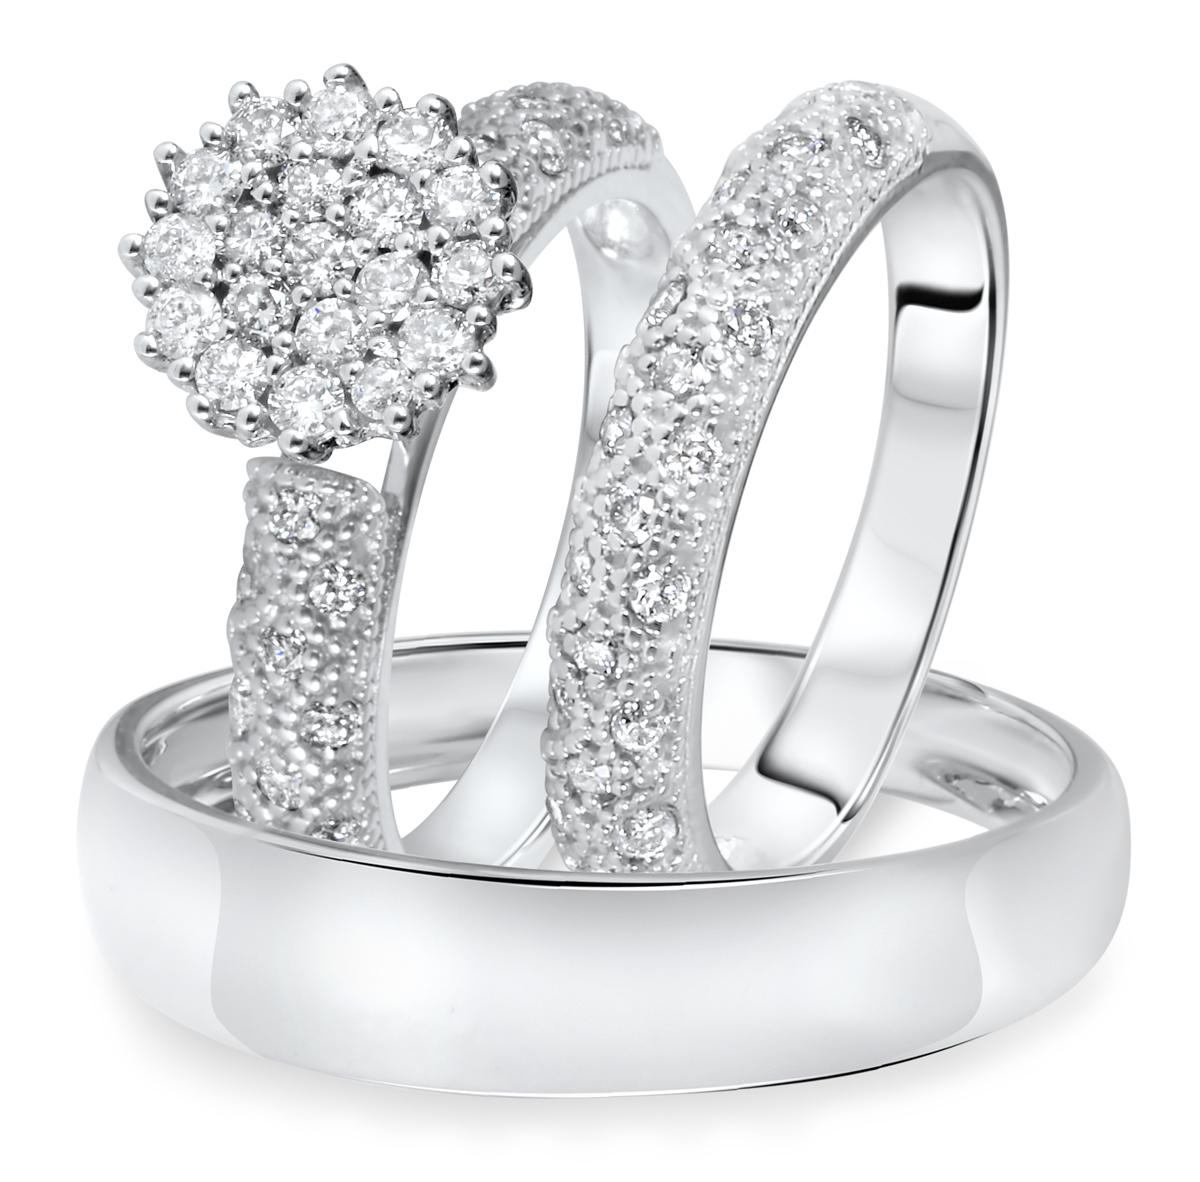 7/8 CT. T.W. Diamond Ladies Engagement Ring, Wedding Band, Men's Wedding Band